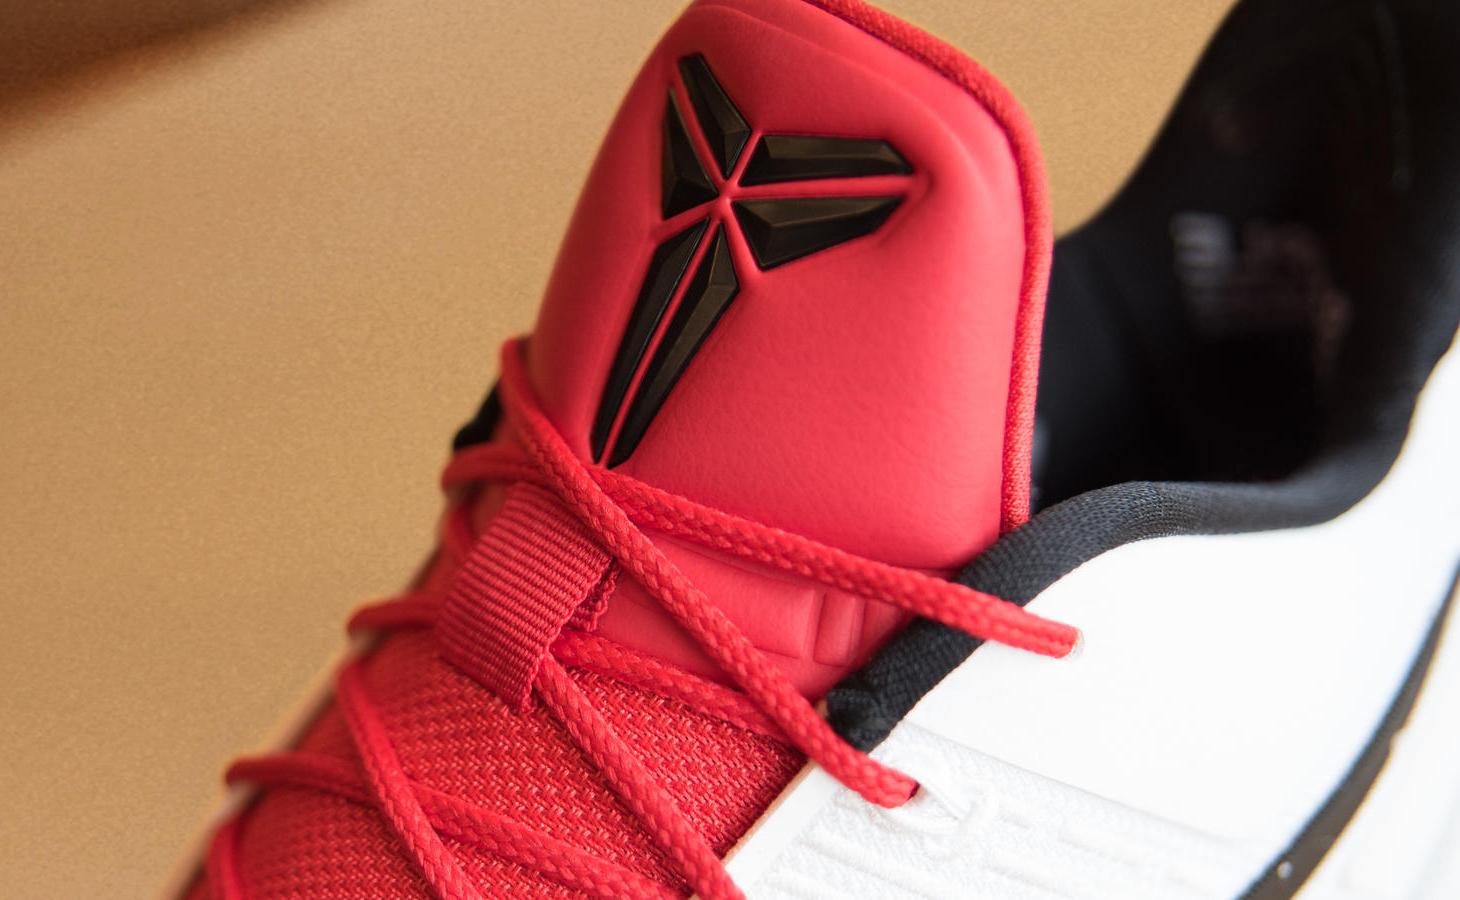 DeMar DeRozan Nike Kobe AD White Black Red Tongue